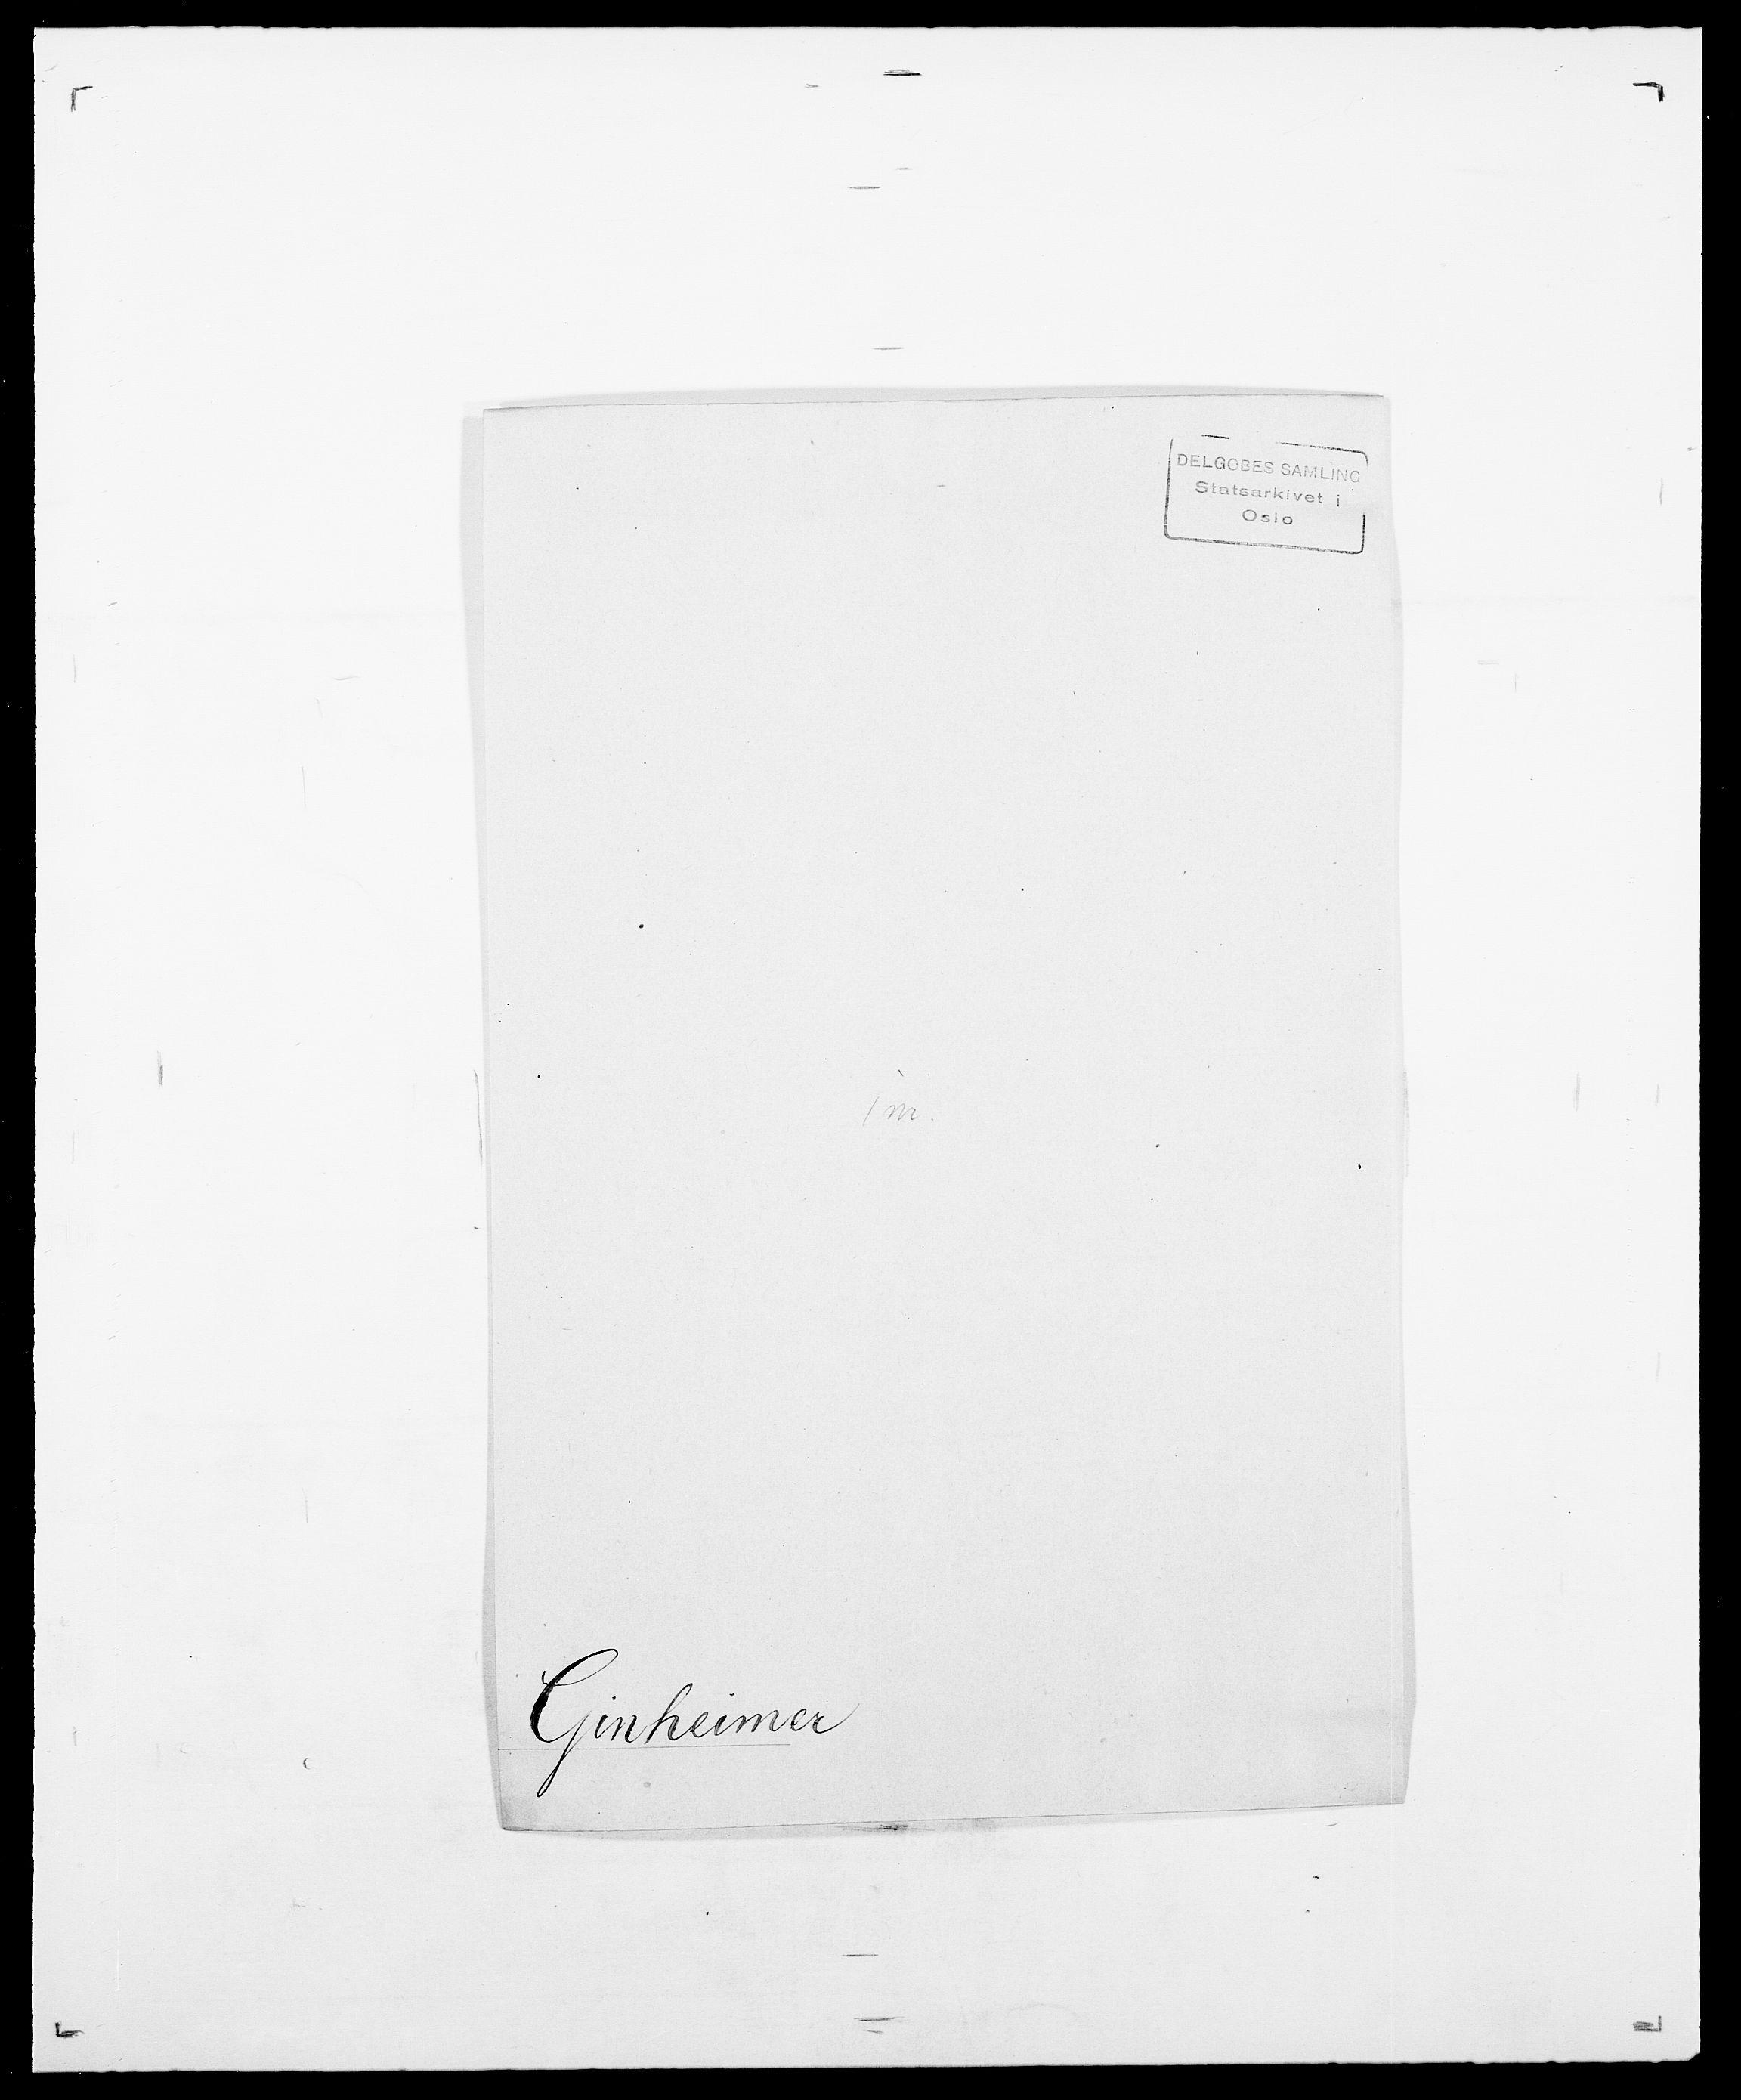 SAO, Delgobe, Charles Antoine - samling, D/Da/L0014: Giebdhausen - Grip, s. 39